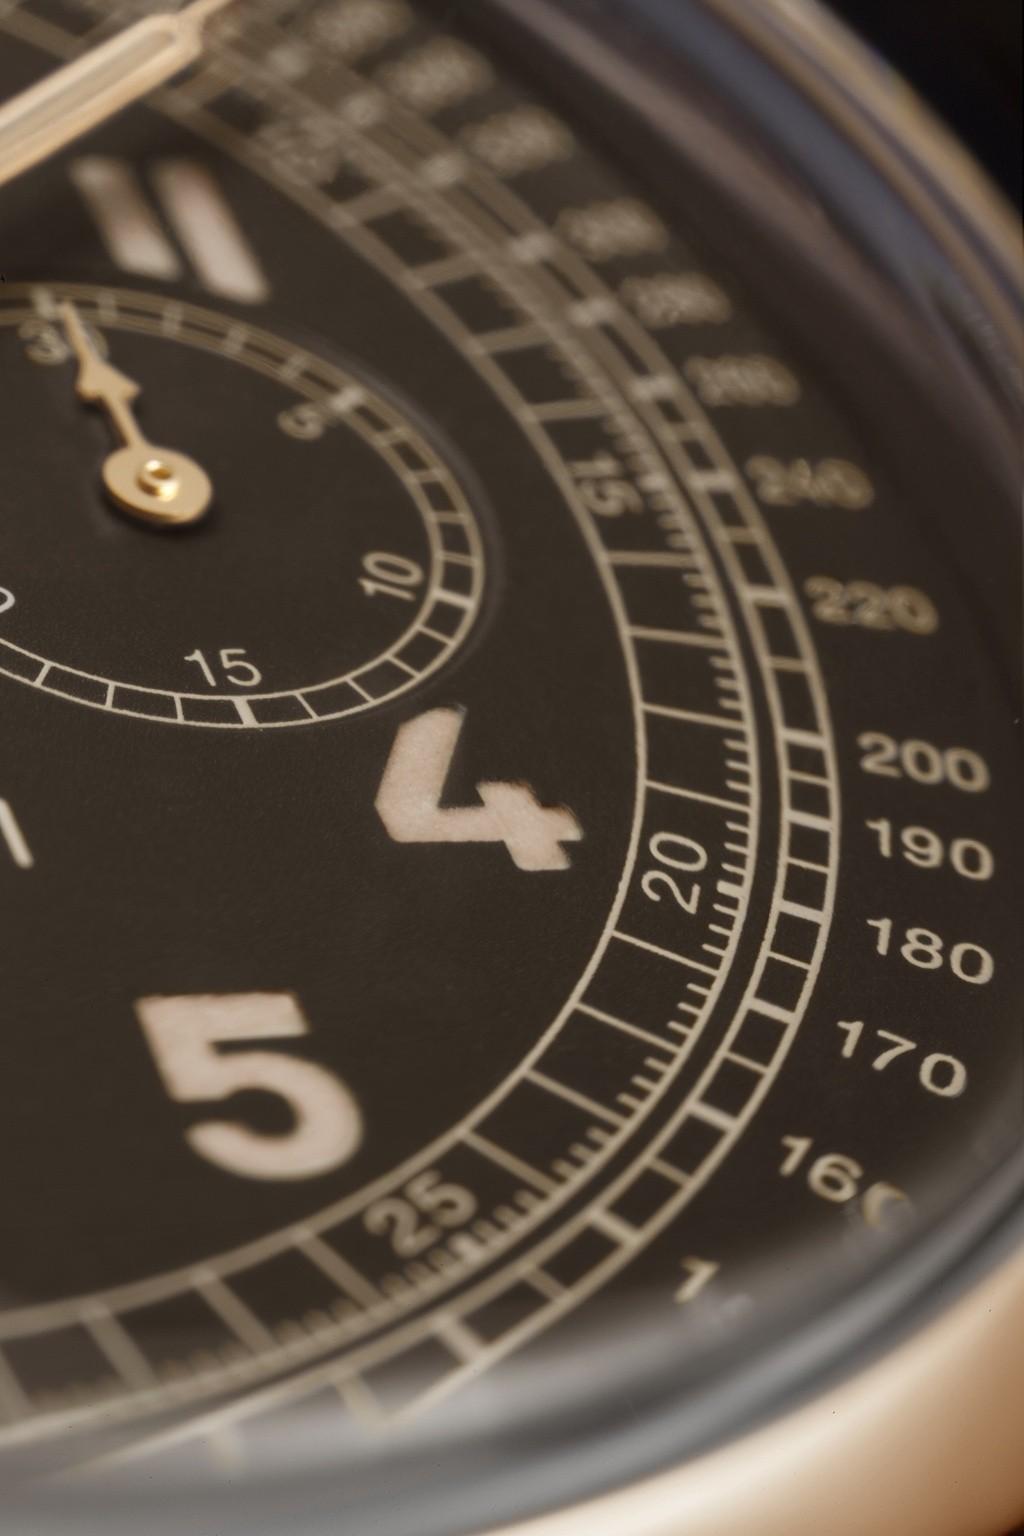 Communiqué de Presse : RADIOMIR 1940 CHRONOGRAPH OR ROUGE – 45mm - PAM00519 - SL 100 ex Pam51915